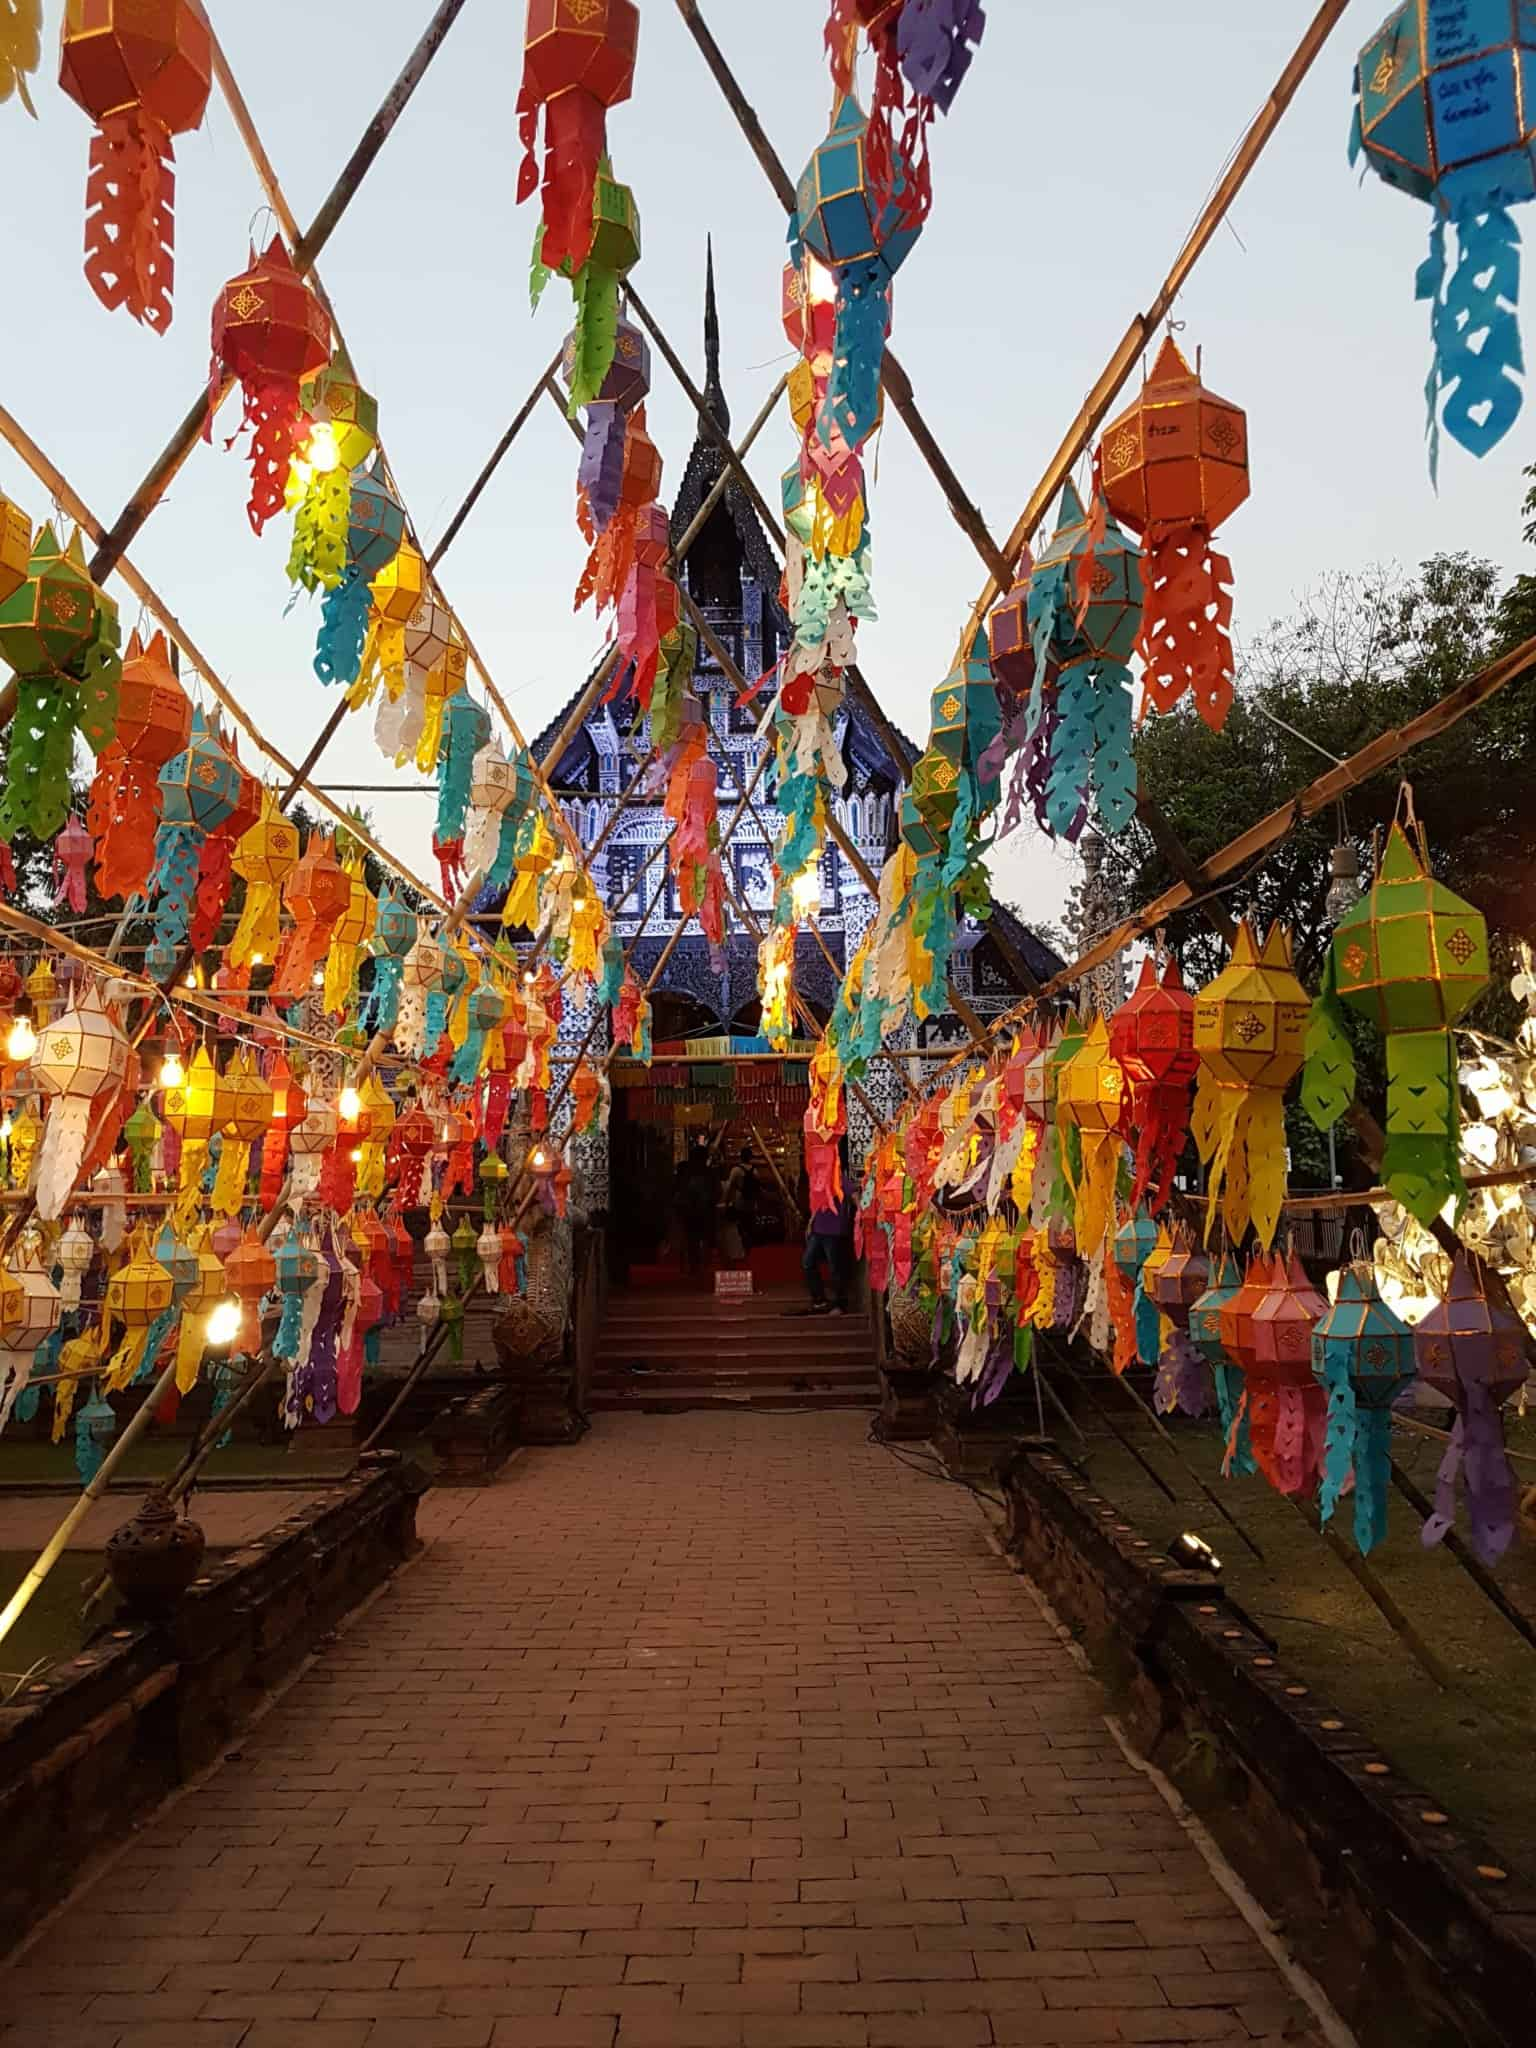 Thaïlande, on continue d'explorer Chiang Mai 👟 11